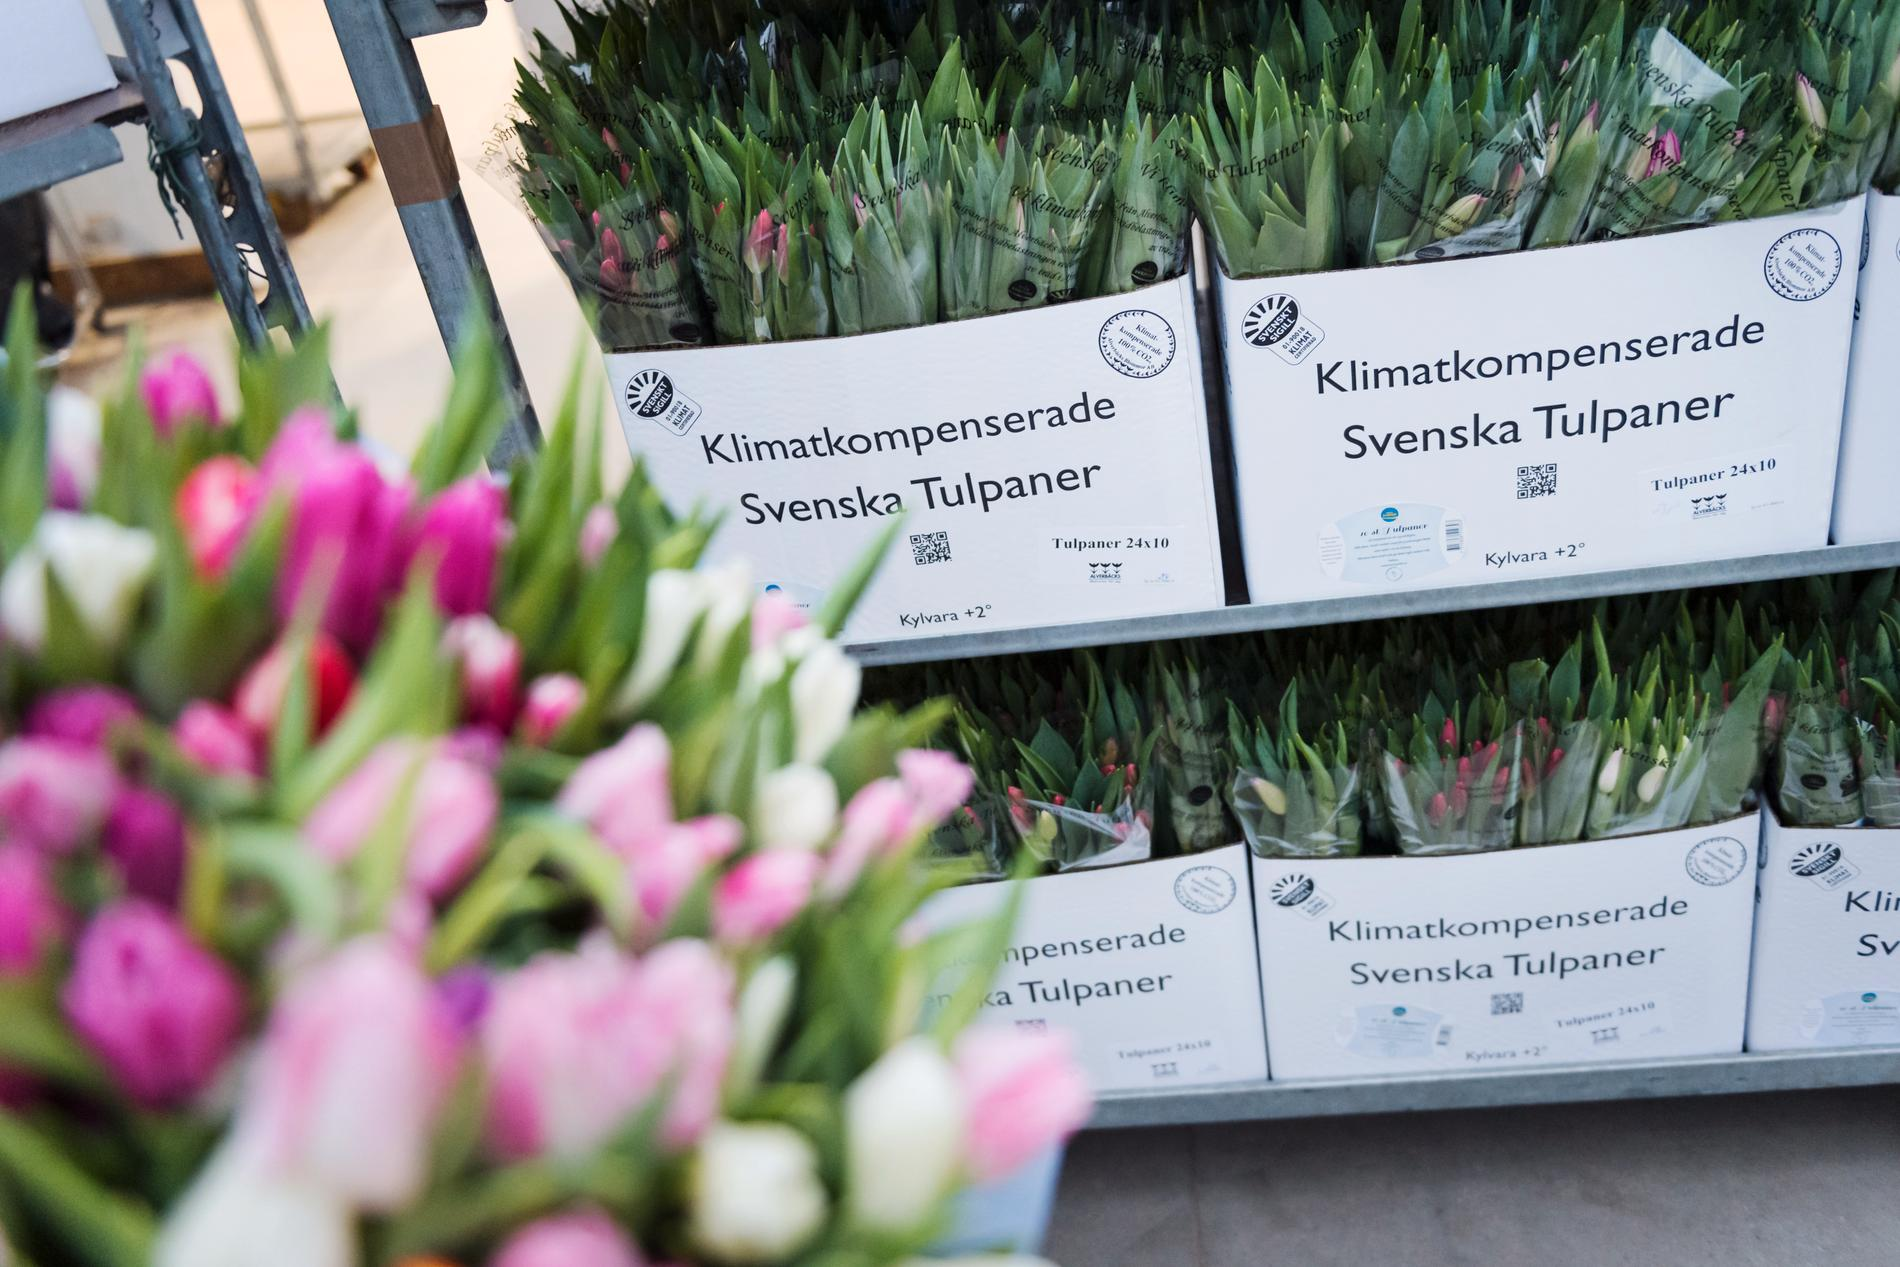 Det odlas 160 miljoner tulpaner i Sverige. Arkivbild.